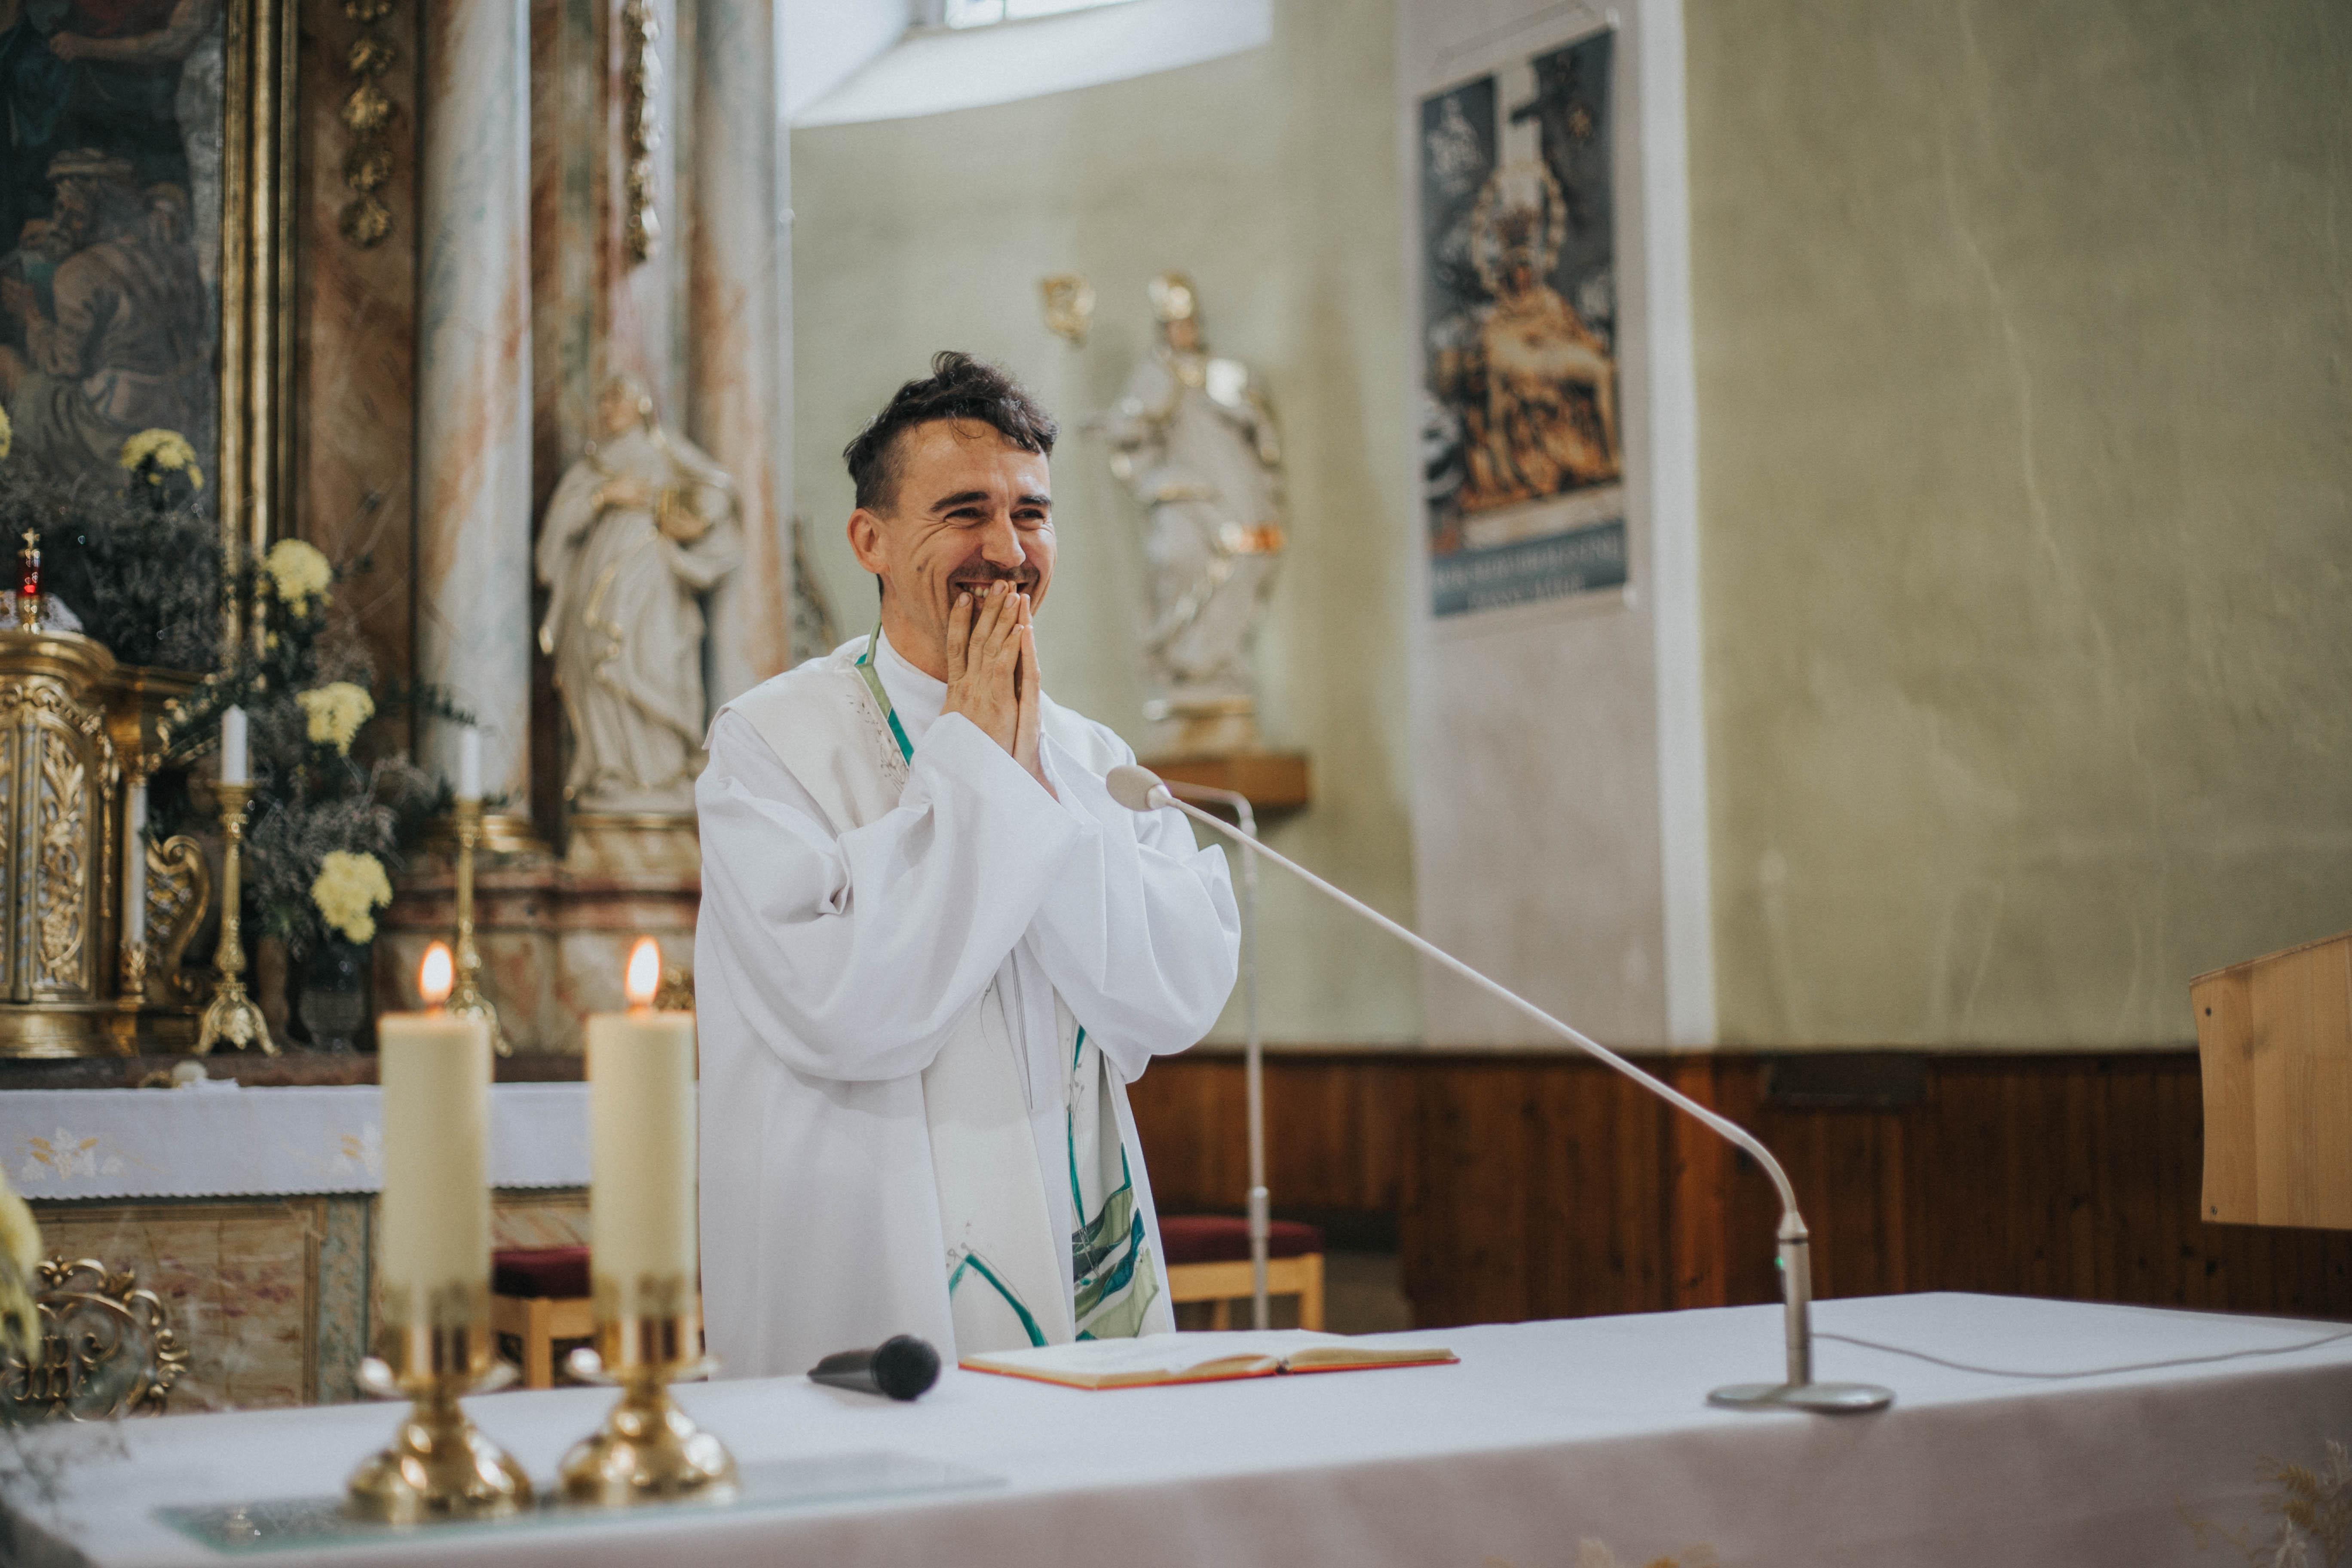 kostol smiech úsmev kňaz